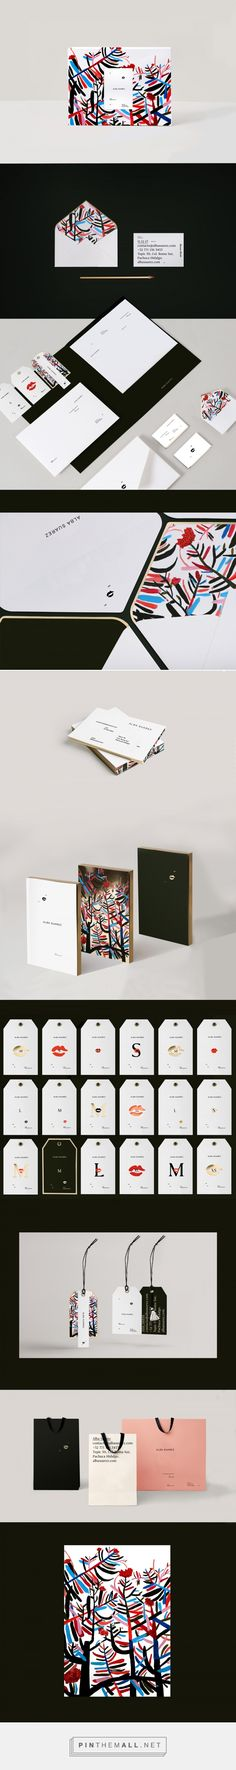 ALBA SUAREZ / branding on Behance - created via https://pinthemall.net